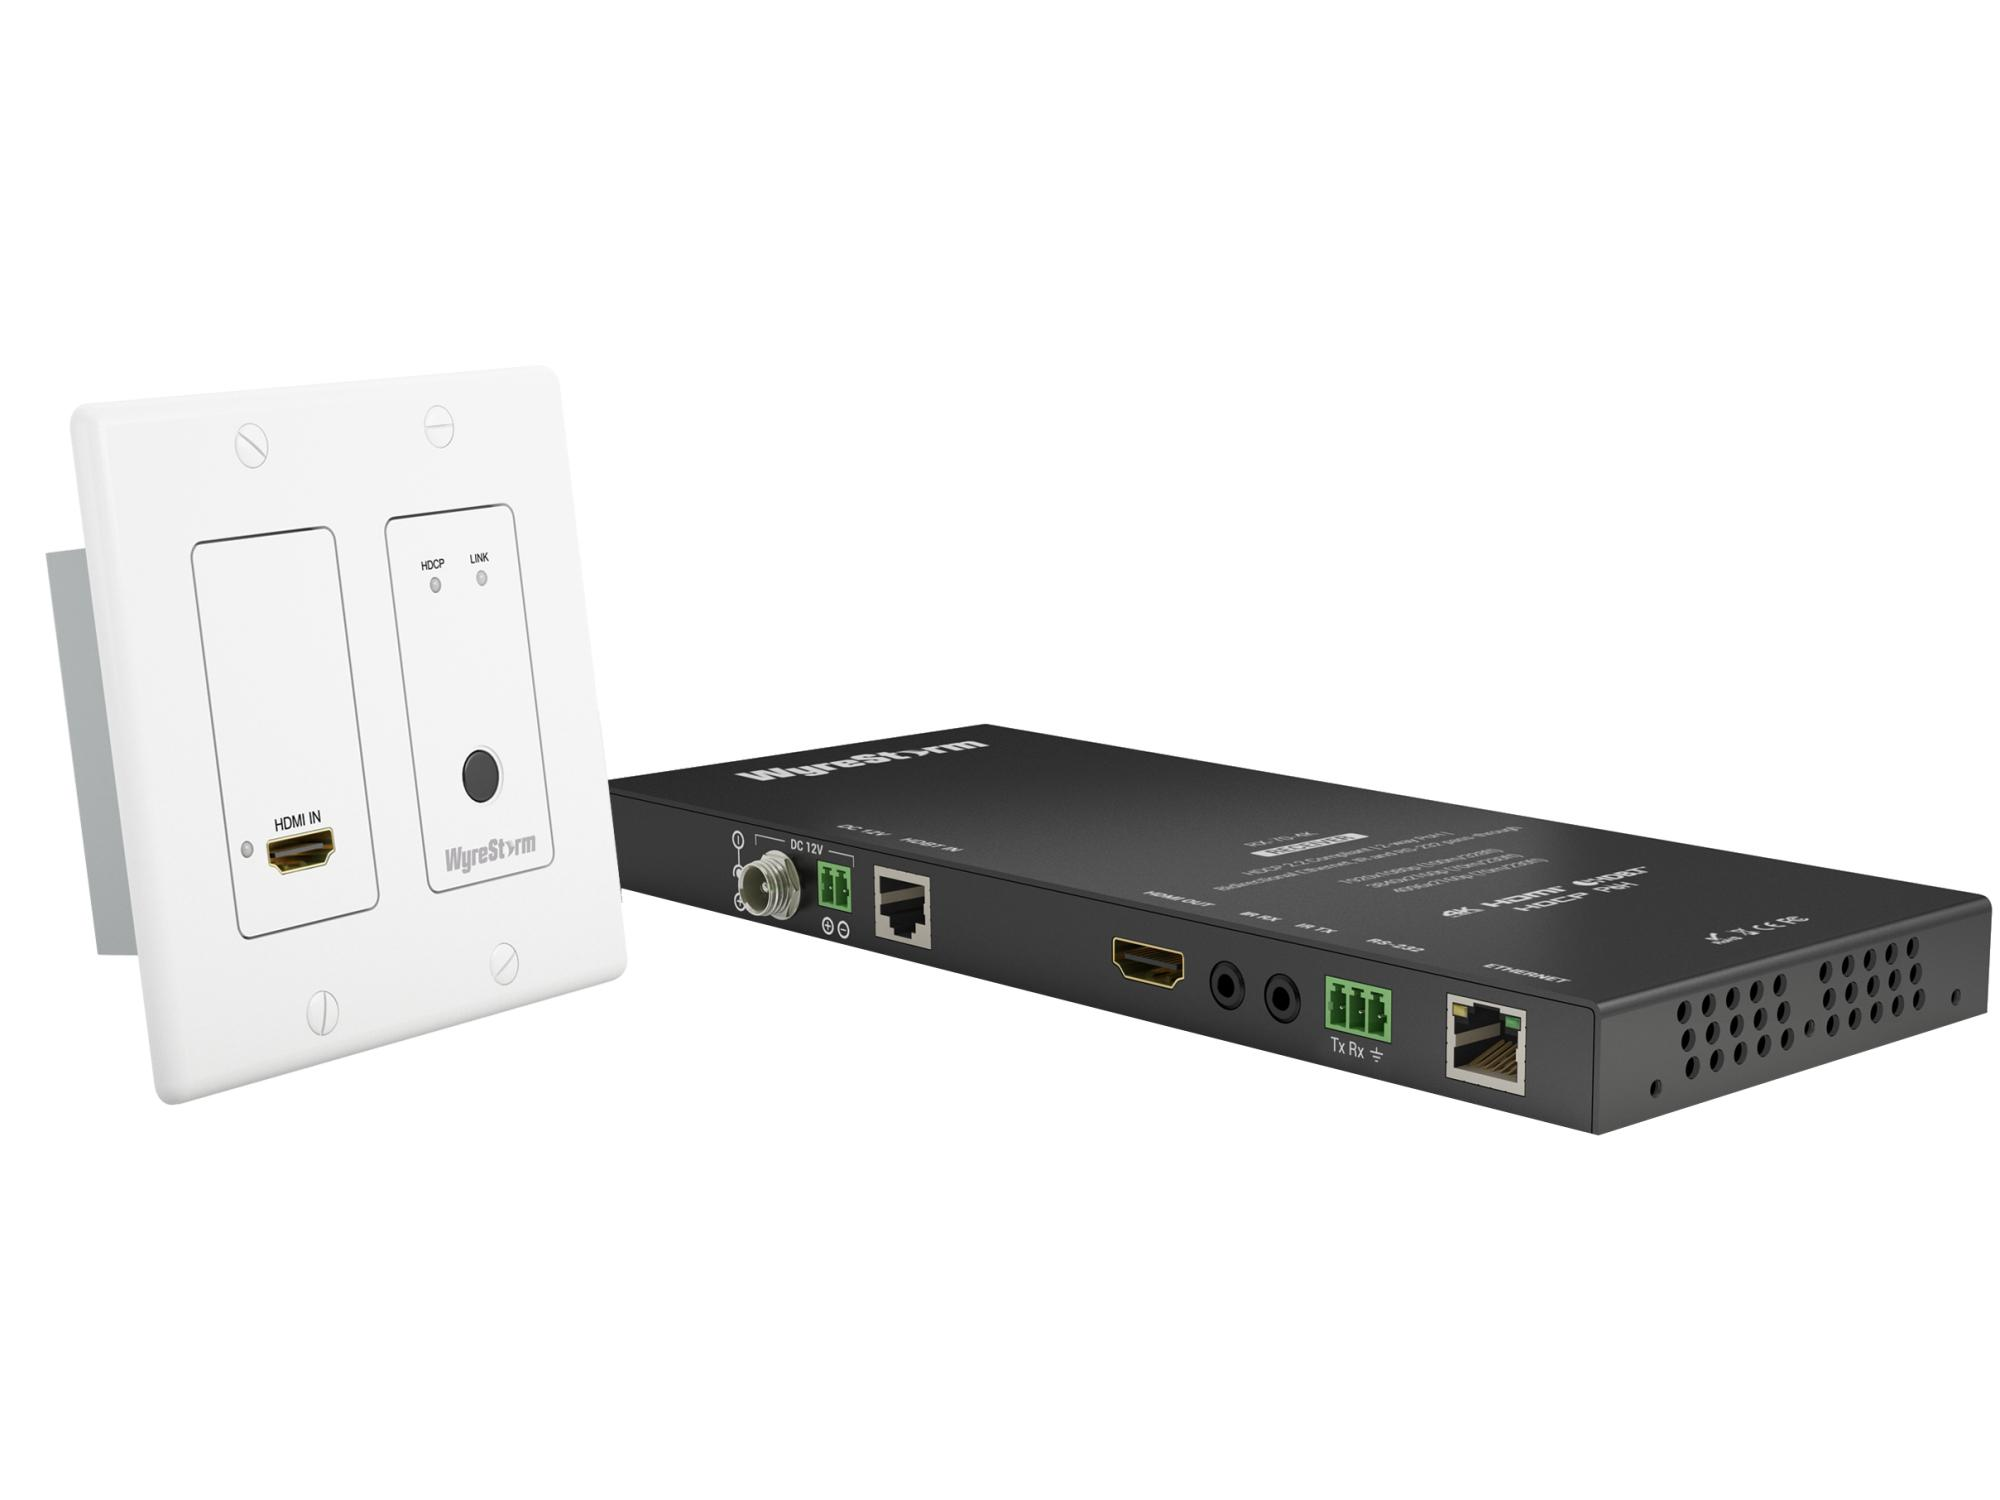 WyreStorm TX-IW-70-POH-KIT HDMI over HDBaseT 2-Gang Decora In-Wall 4K UHD Extender (Transmitter/Receiver) Kit